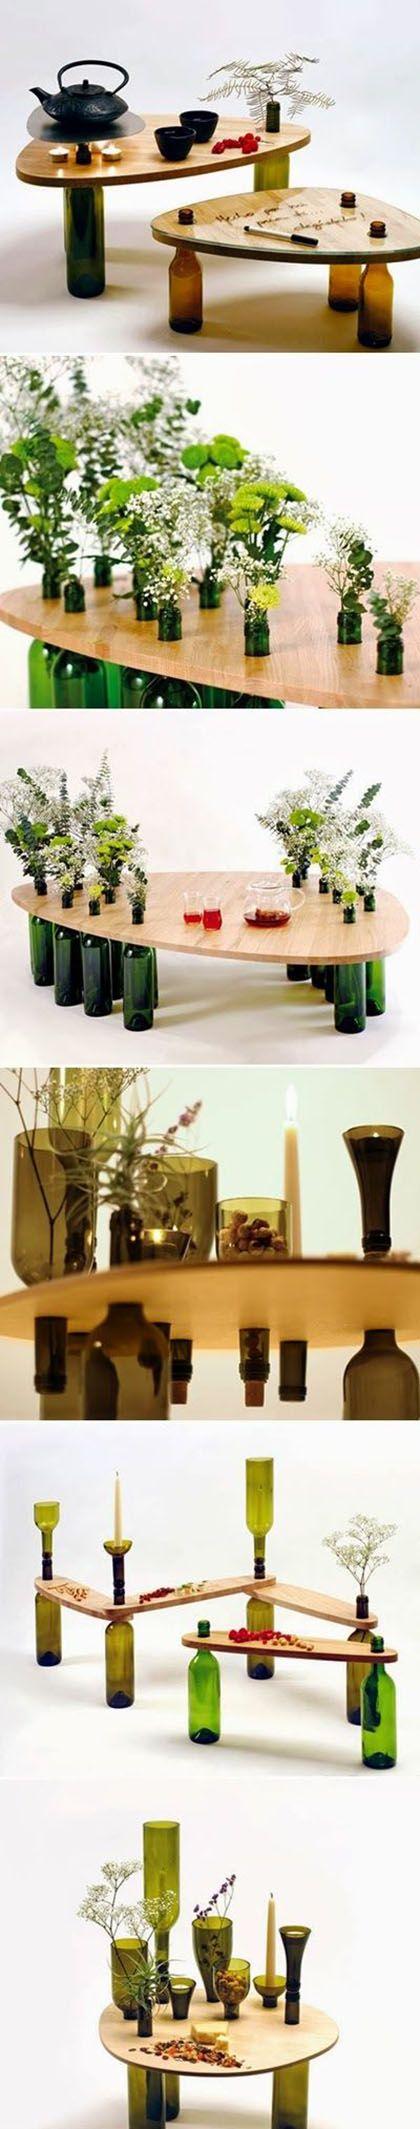 "Great Bottle Craft Idea | DIY & Crafts Tutorials www.LiquorList.com ""The Marketplace for Adults with Taste!"" @LiquorListcom #LiquorList"